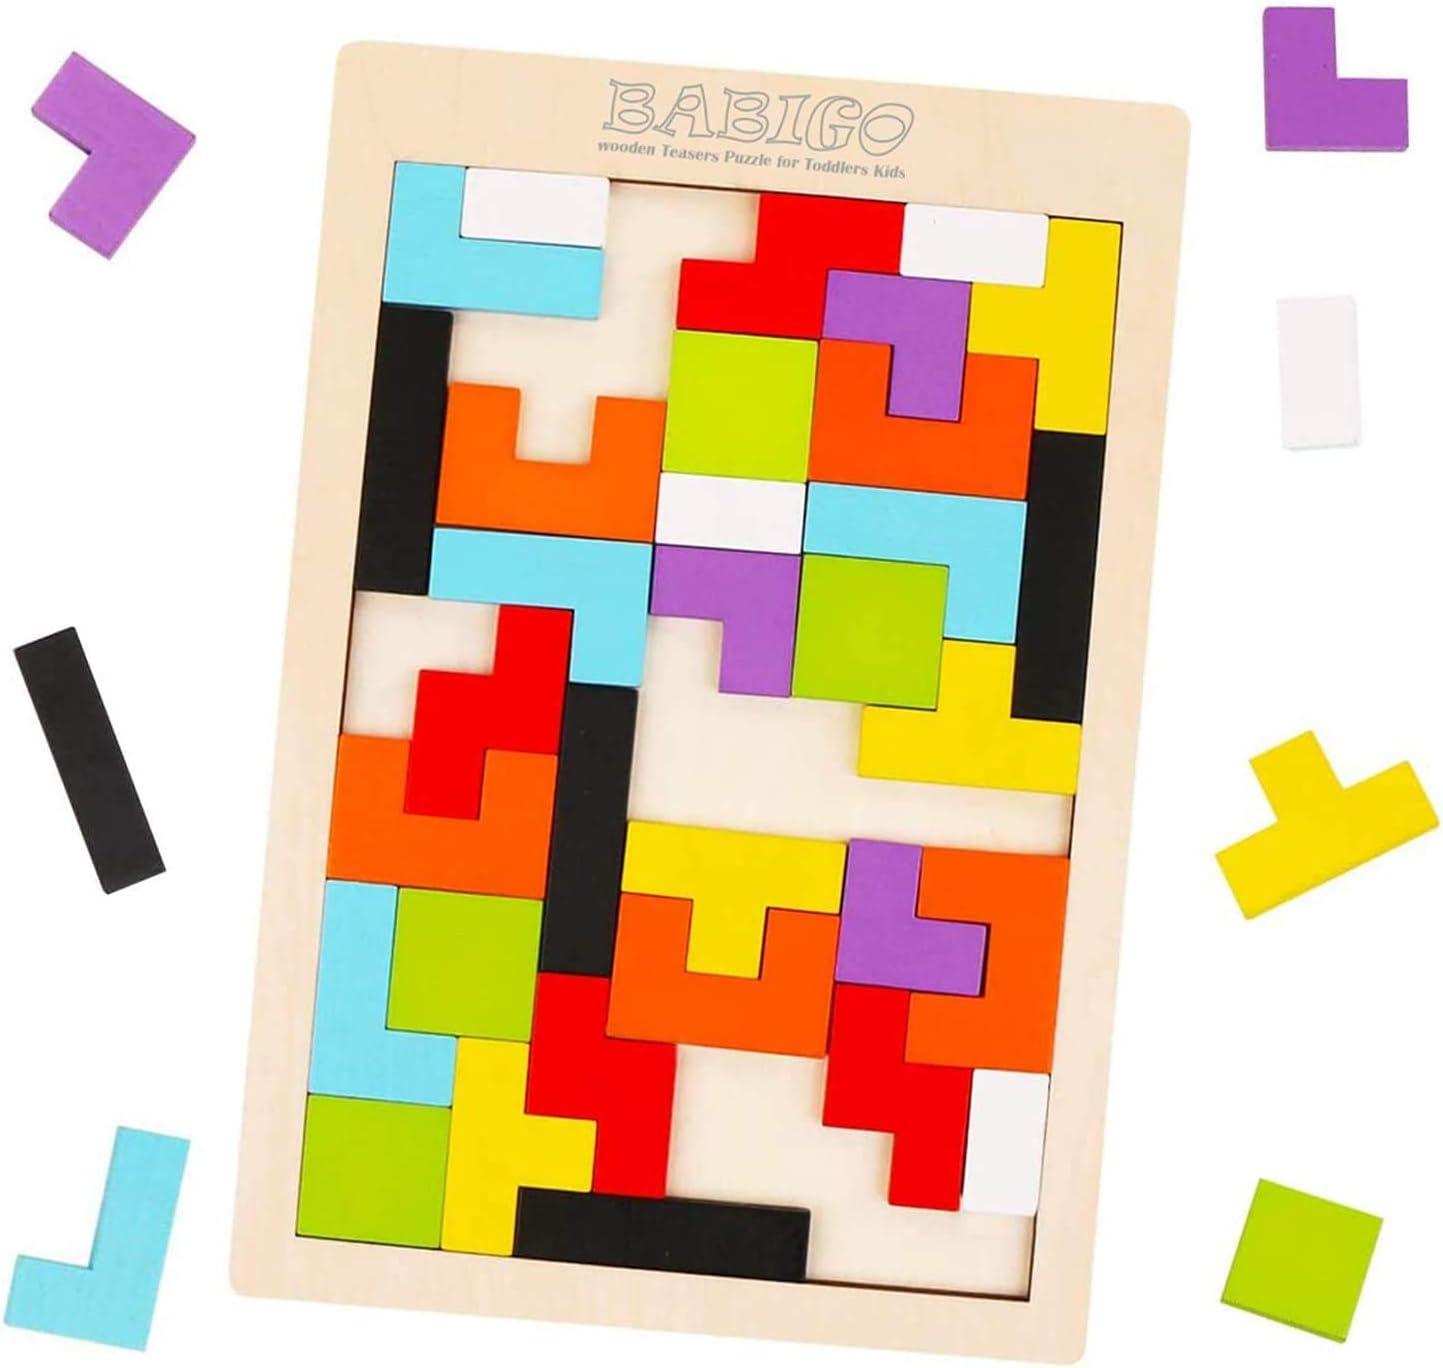 Babigo Wooden Puzzle Brain Teasers Toy, Tangram Jigsaw Puzzle, Brain Teasers Toy, Stem Toys with Colorful 3D Russian Blocks,Montessori Educational Gift for Kids & Adults